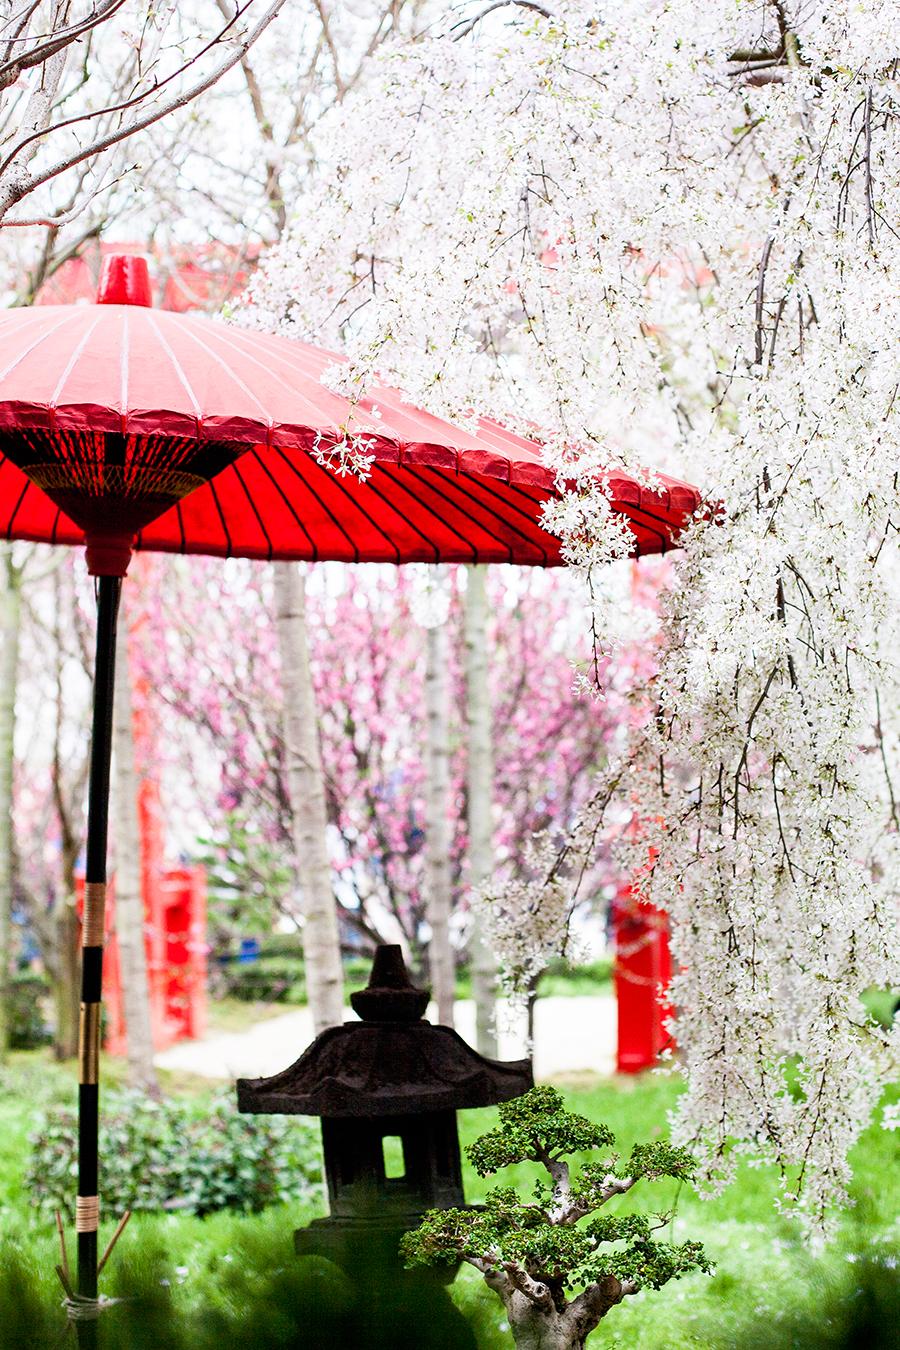 Japanese garden umbrella among Sakura at the Flower Dome at Gardens by the Bay, Singapore.